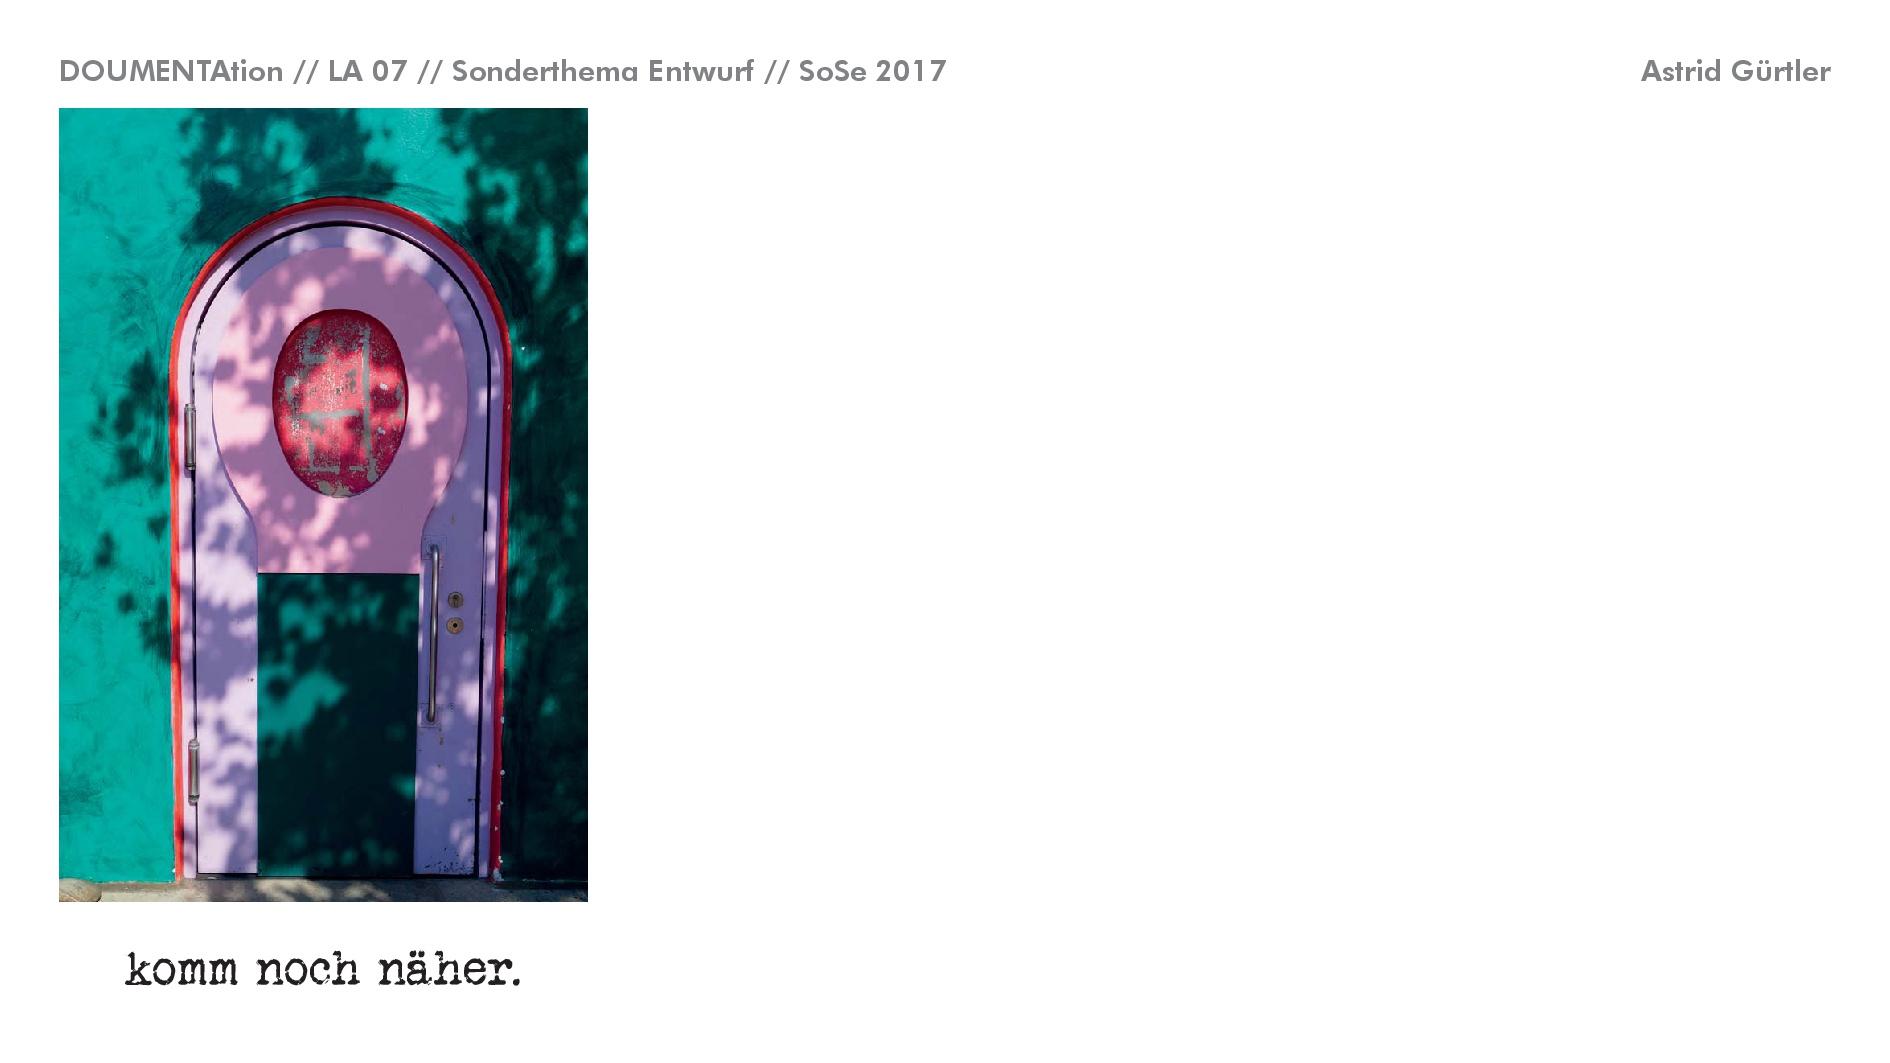 NEU Sonderthema Entwerfen SoSe 17 020